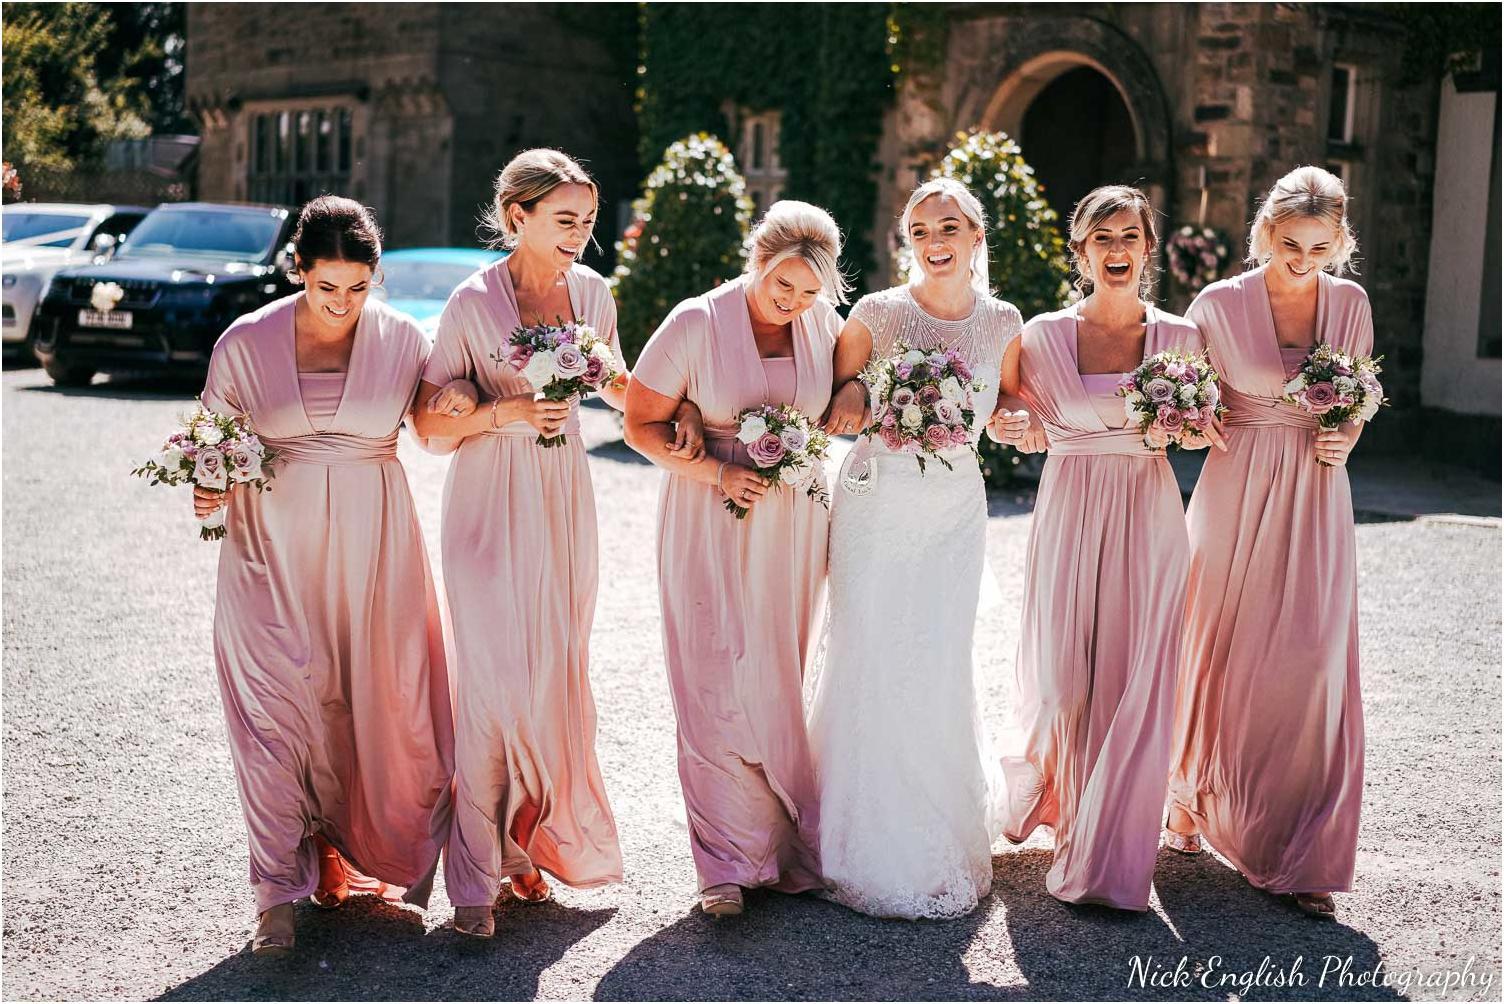 Mitton_Hall_Wedding_Photograph-96.jpg